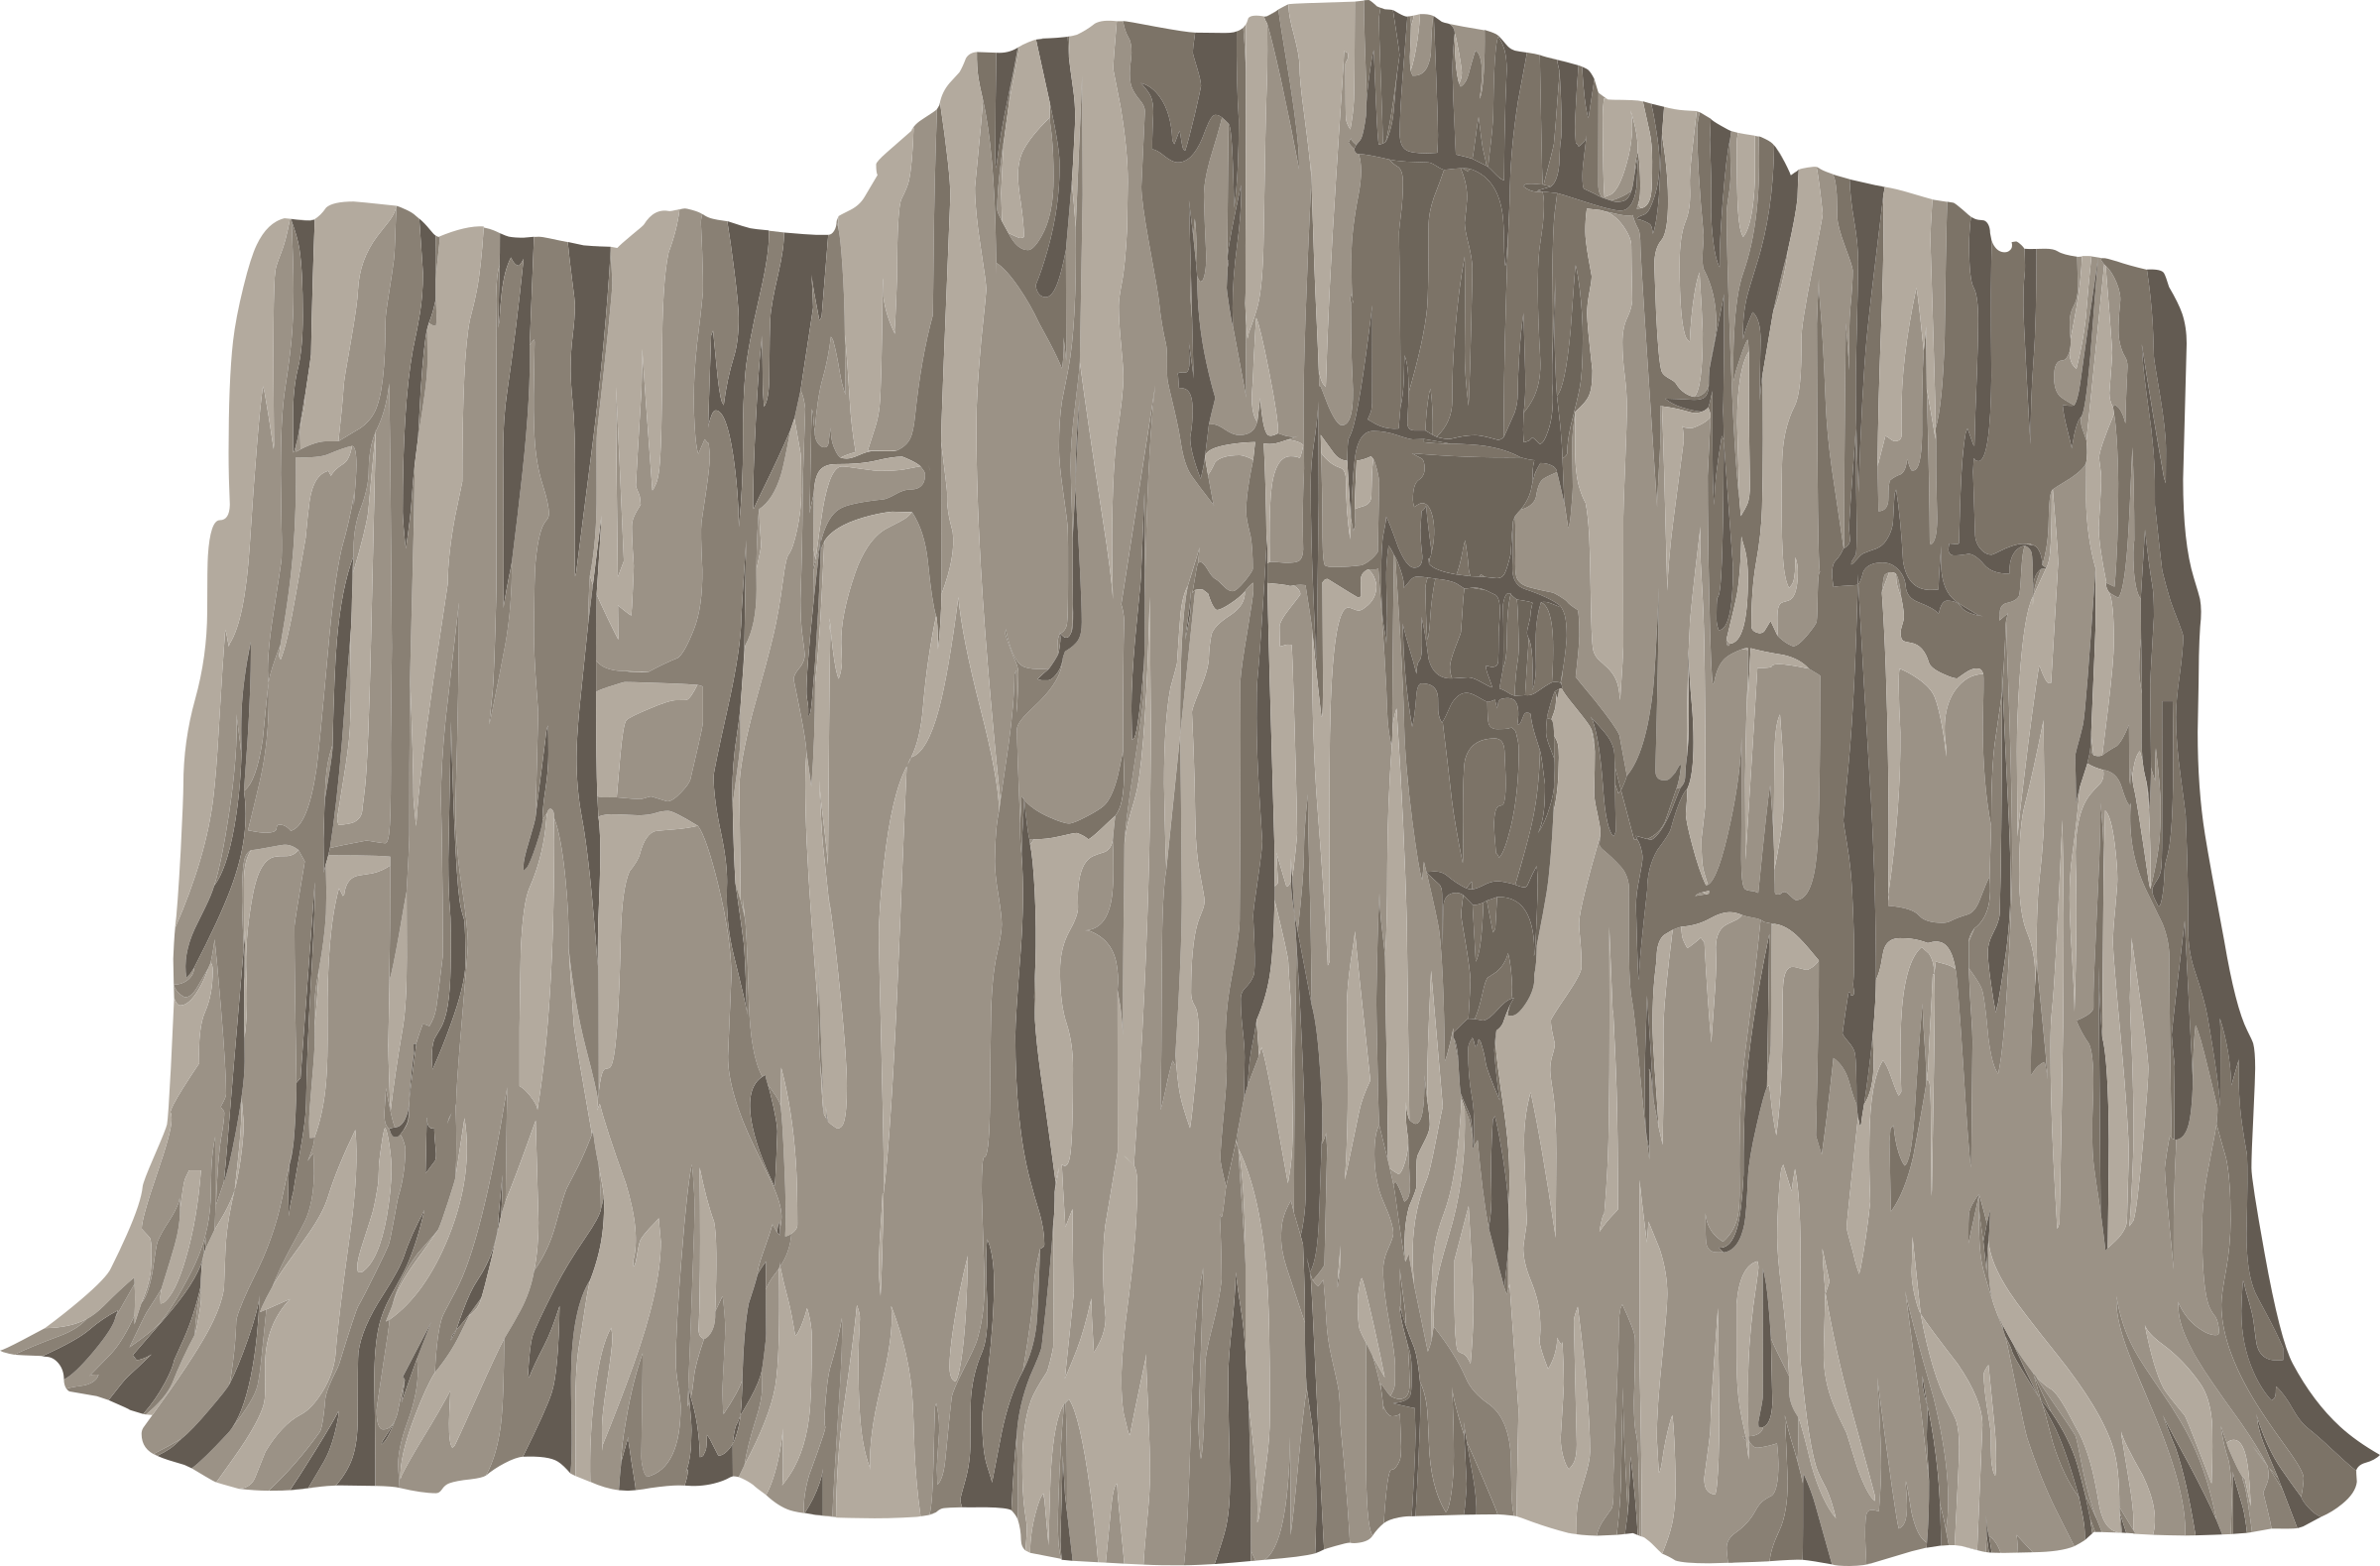 Cliff cliff face